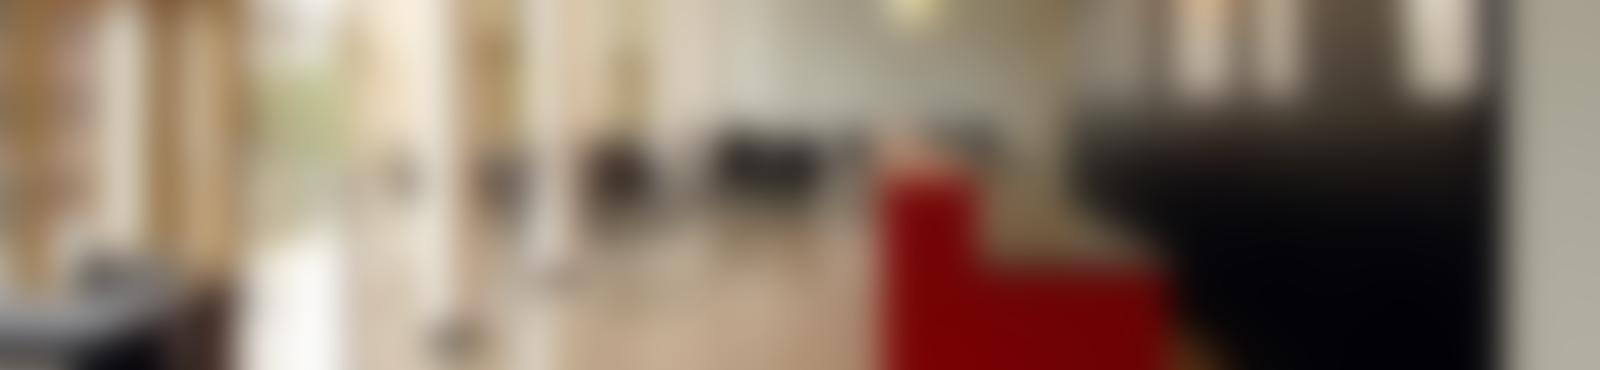 Blurred 5ea35b18 50cb 4510 b48a 8faee1870300